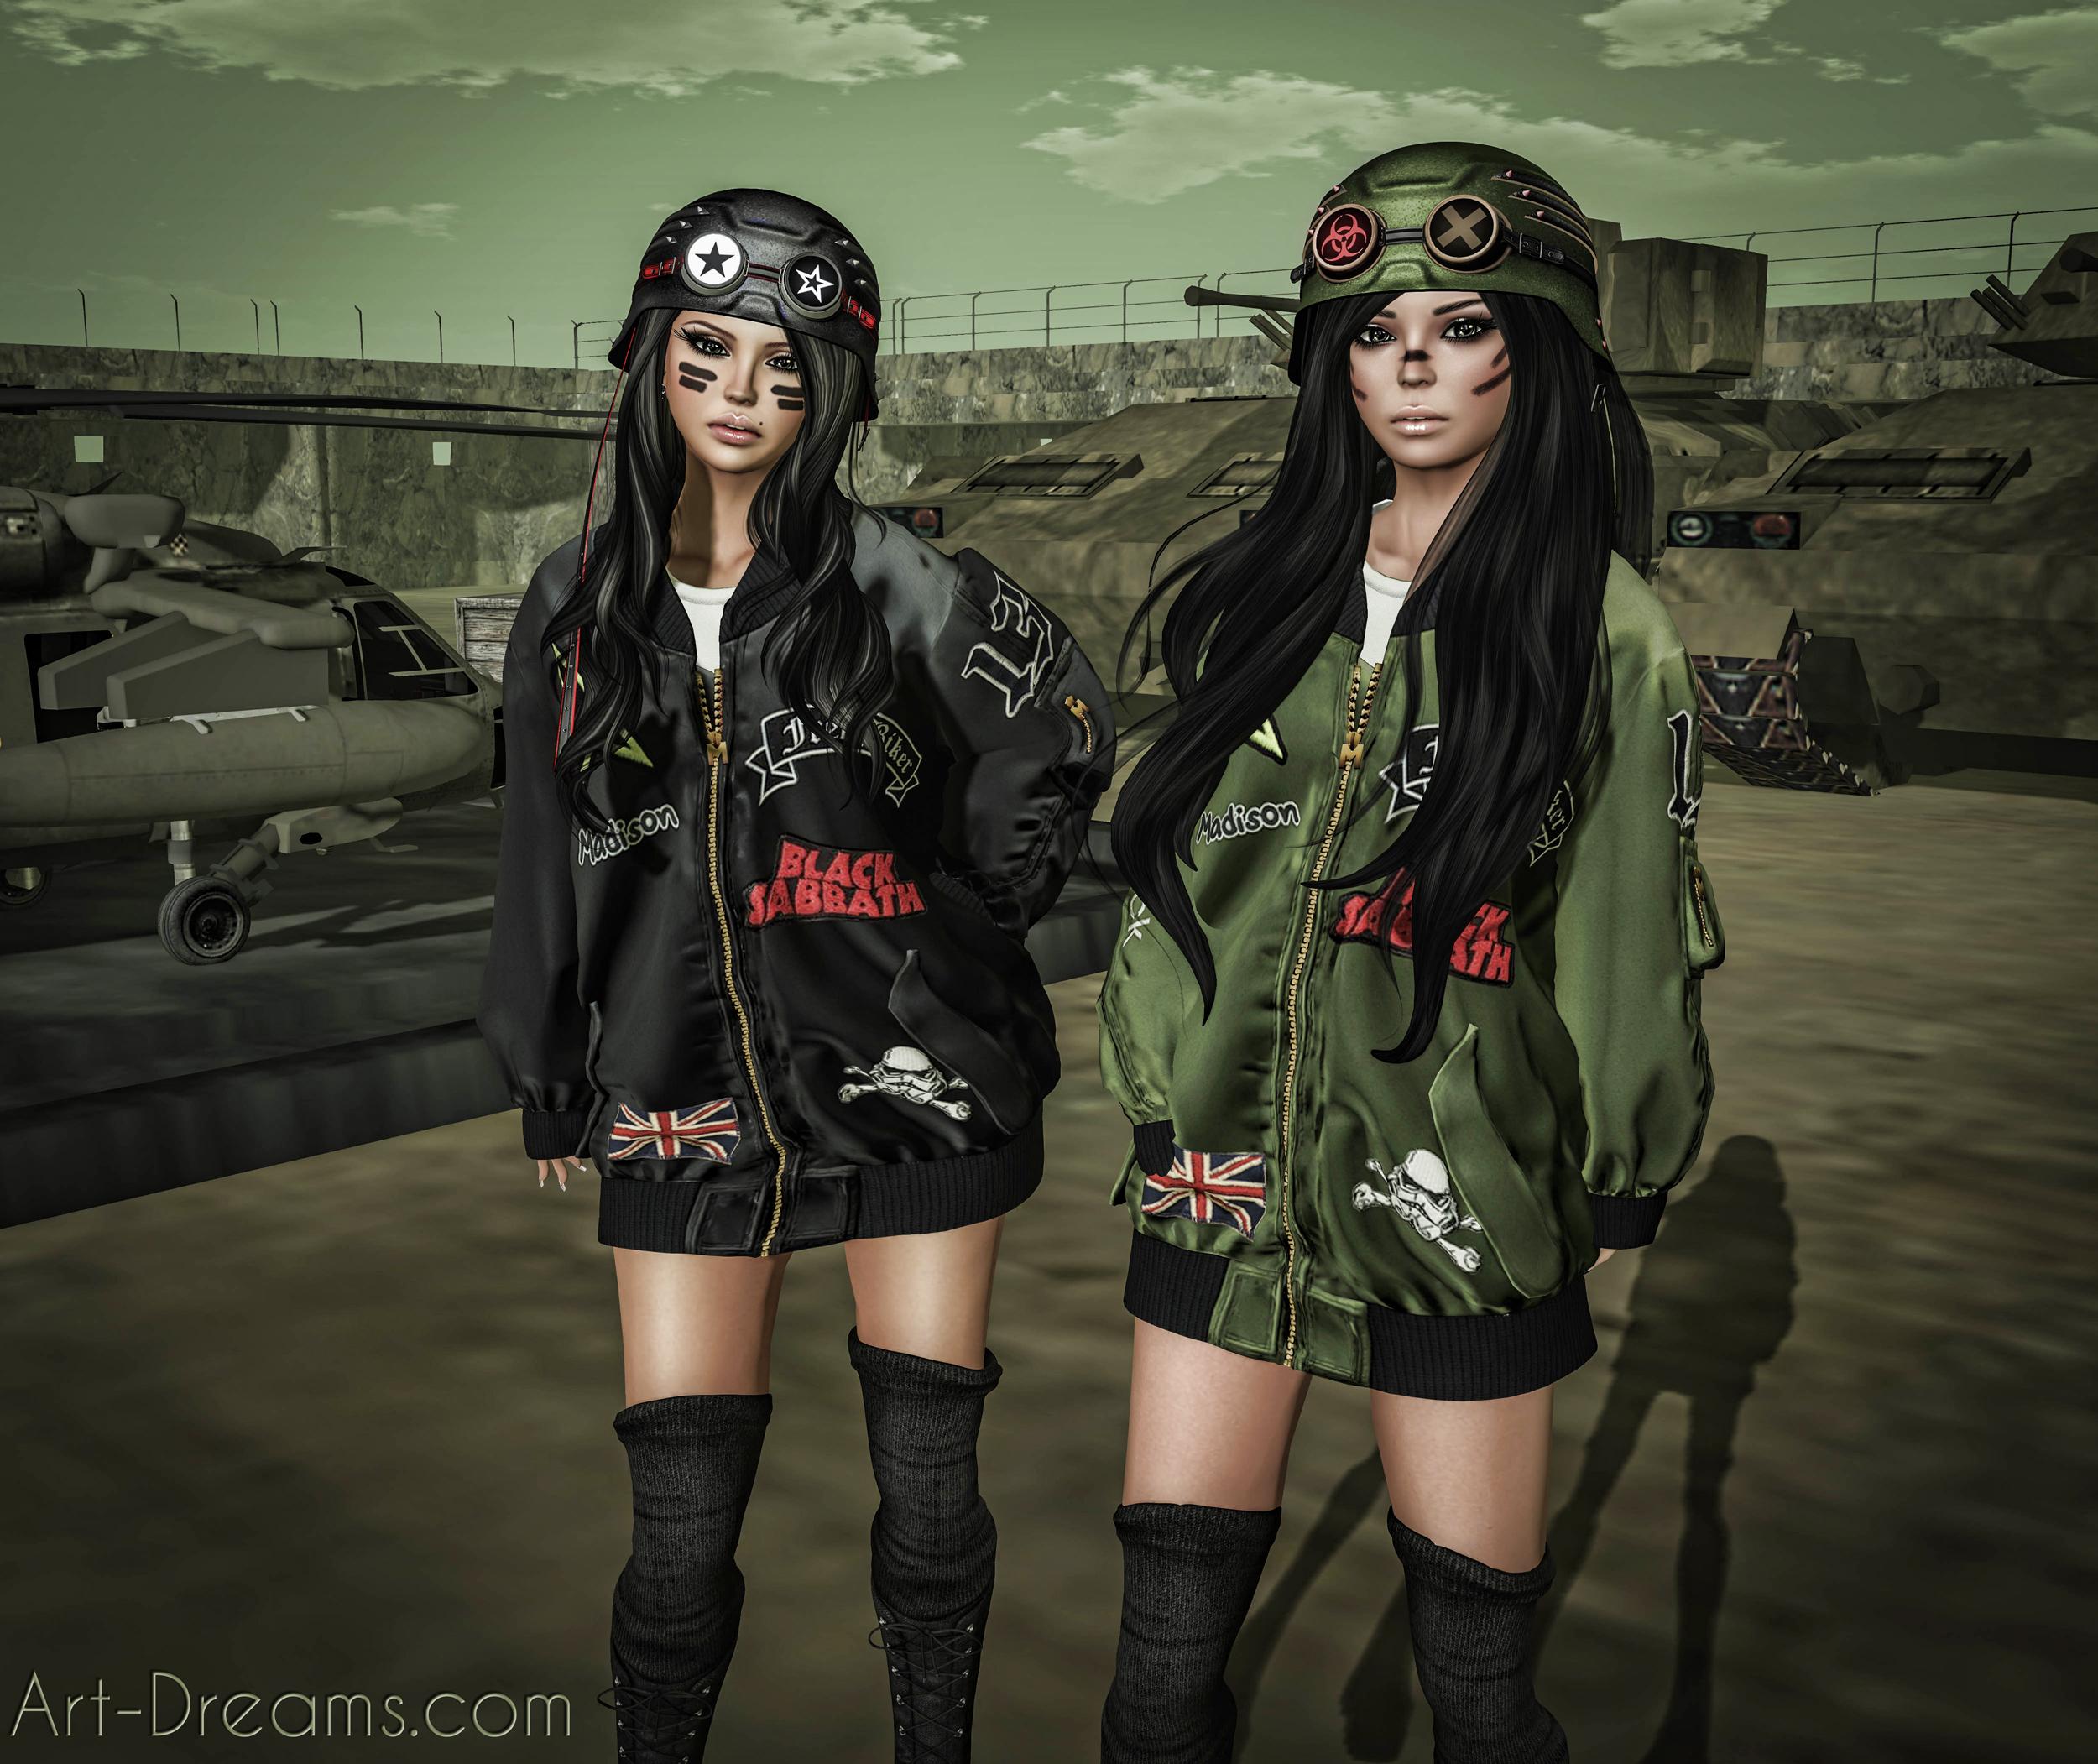 Wallpaper Face Black Anime Socks War Stars Tattoo Soldier Tank Helmet Fashion Baby Hair Military Barrels Back Life Boots Wire Artemis